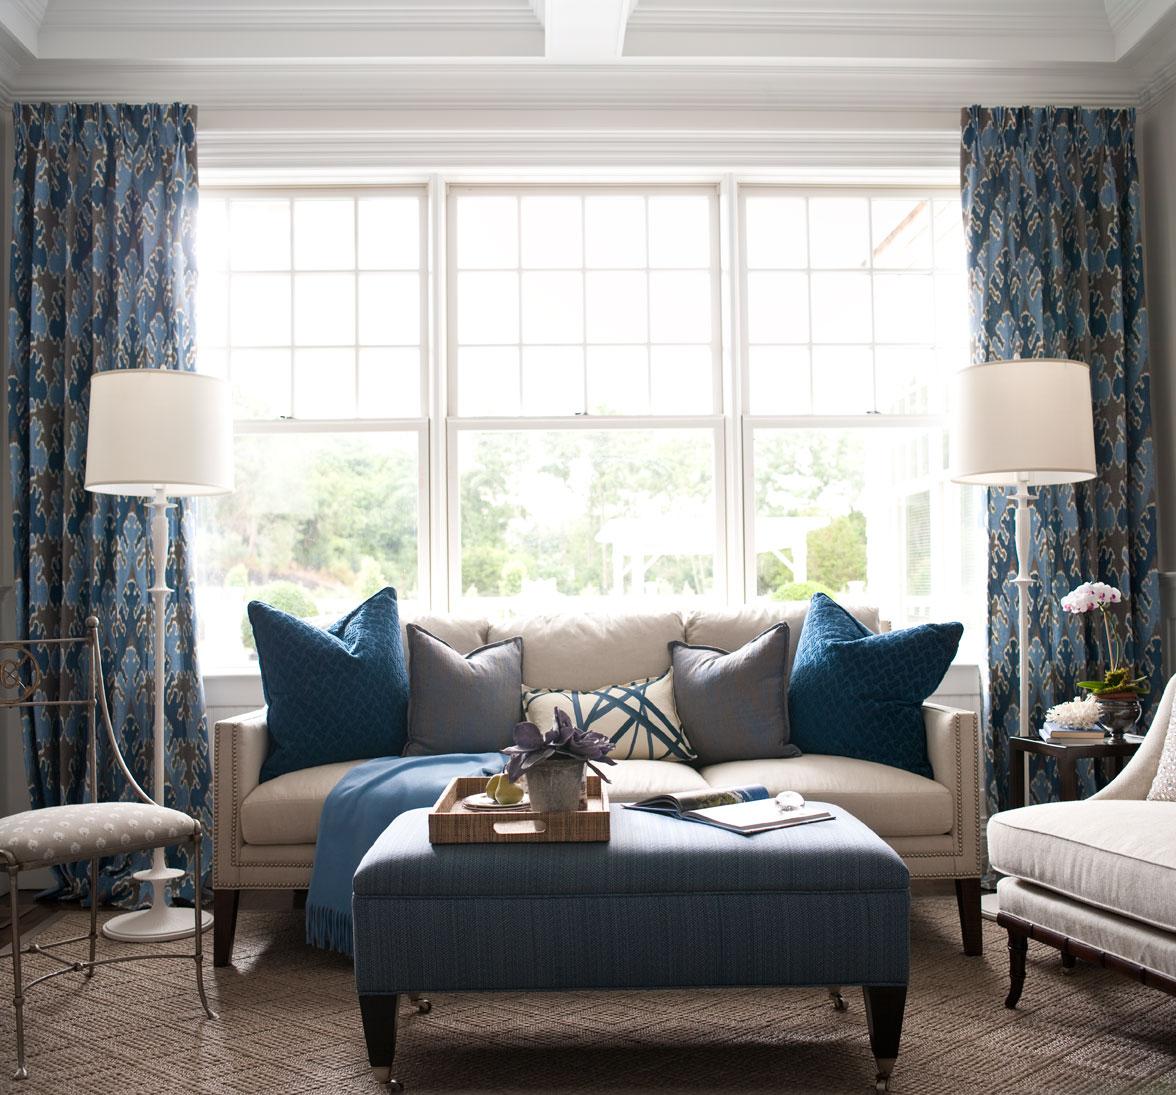 Top Long Island Interior Designer Kate Singer